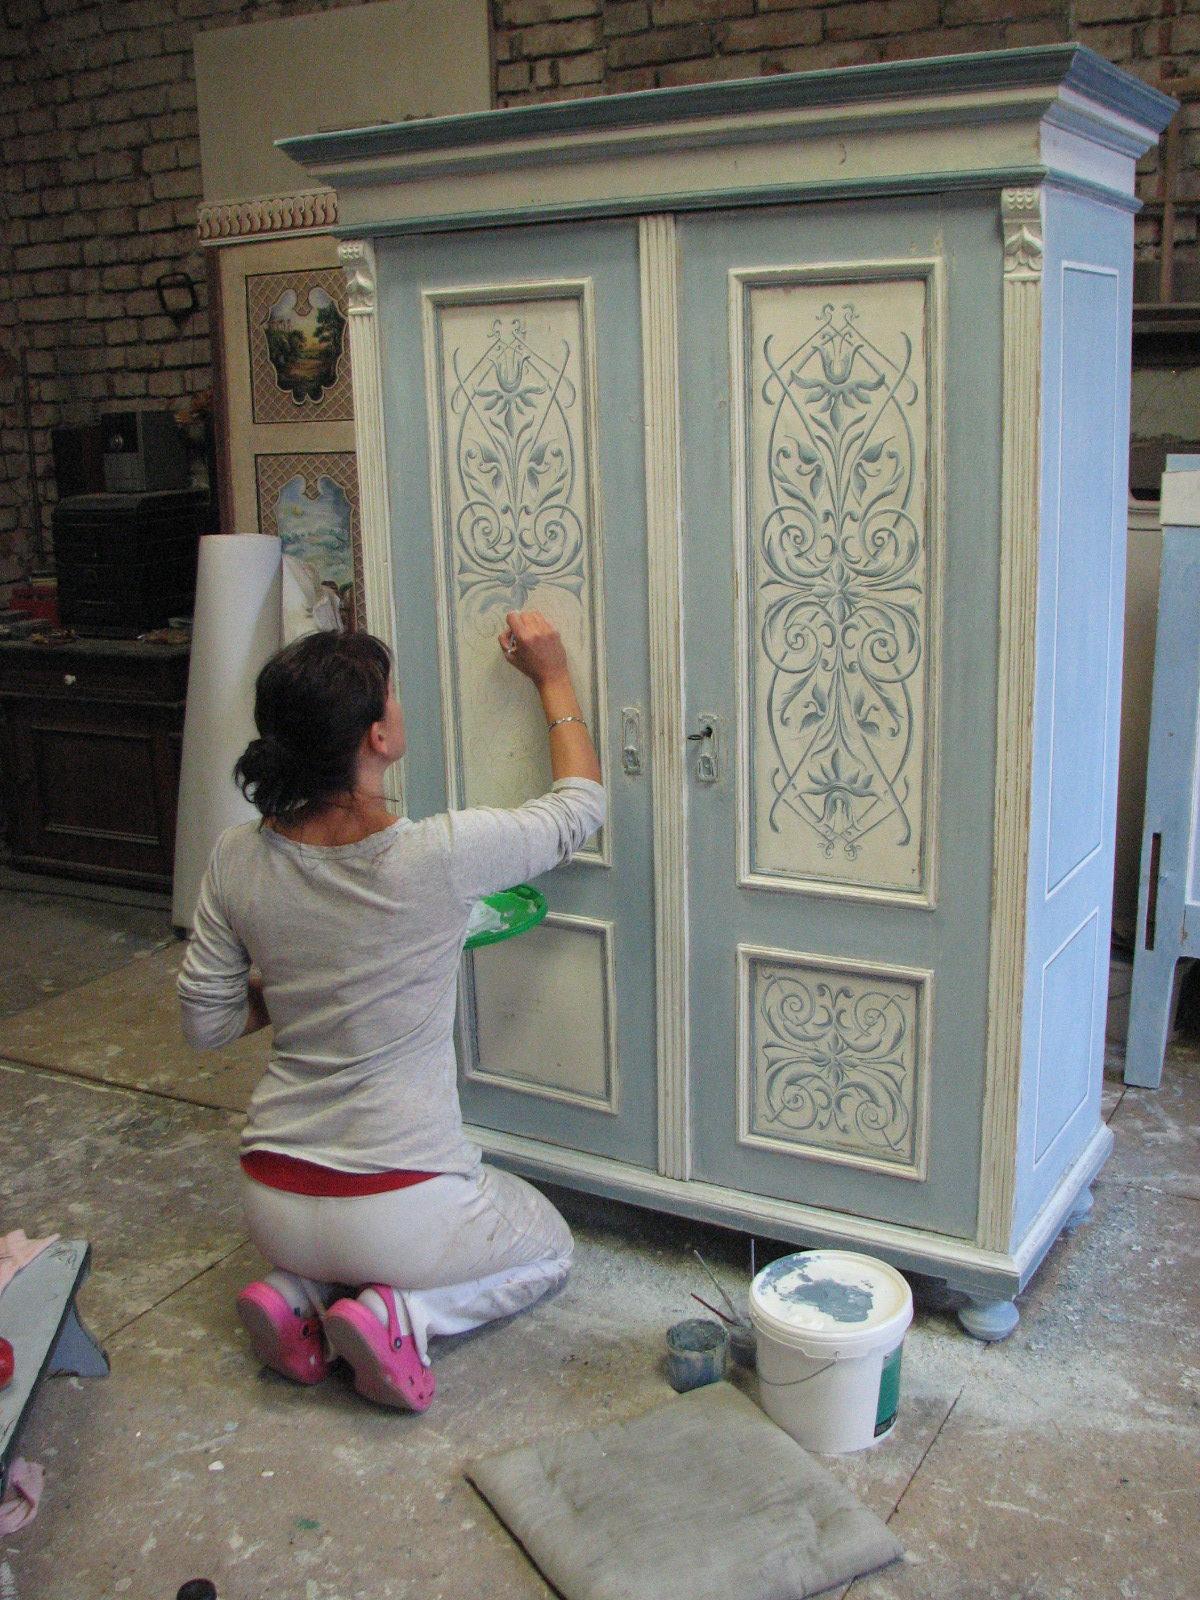 Malovaná šedo-modrá skříň s ornamentálem